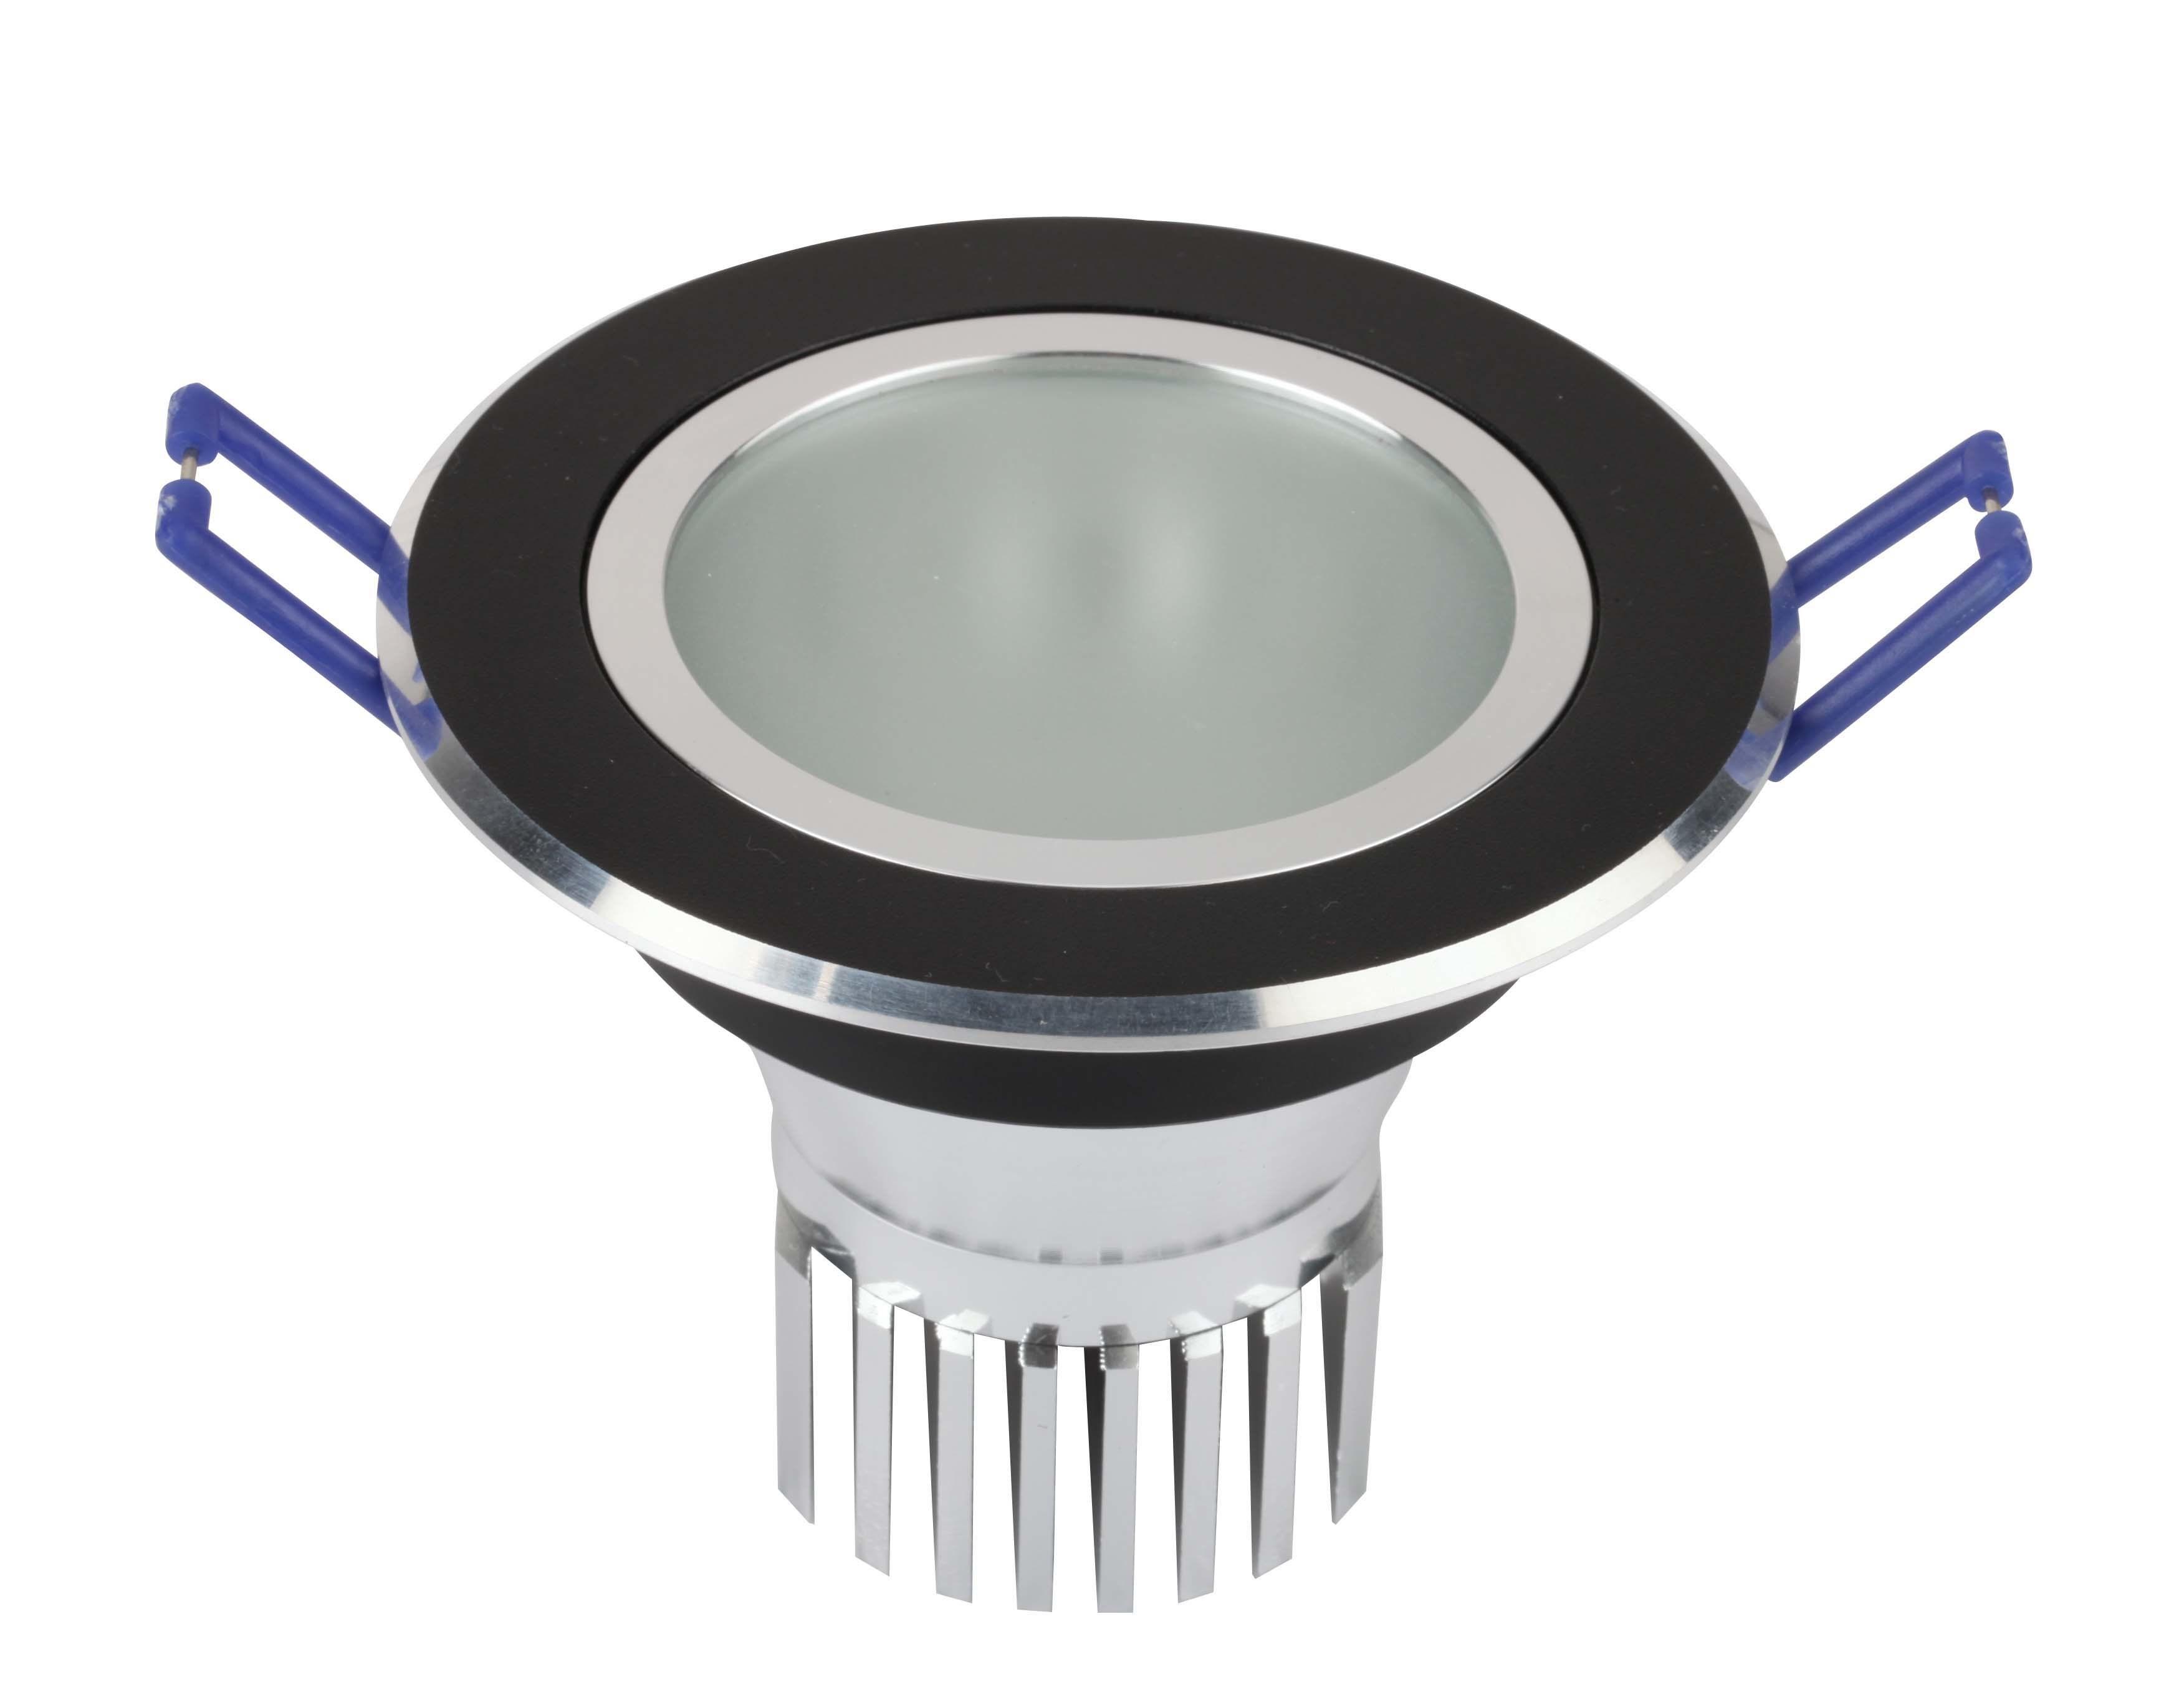 retrofit recessed round led ceiling light china led down light dim. Black Bedroom Furniture Sets. Home Design Ideas